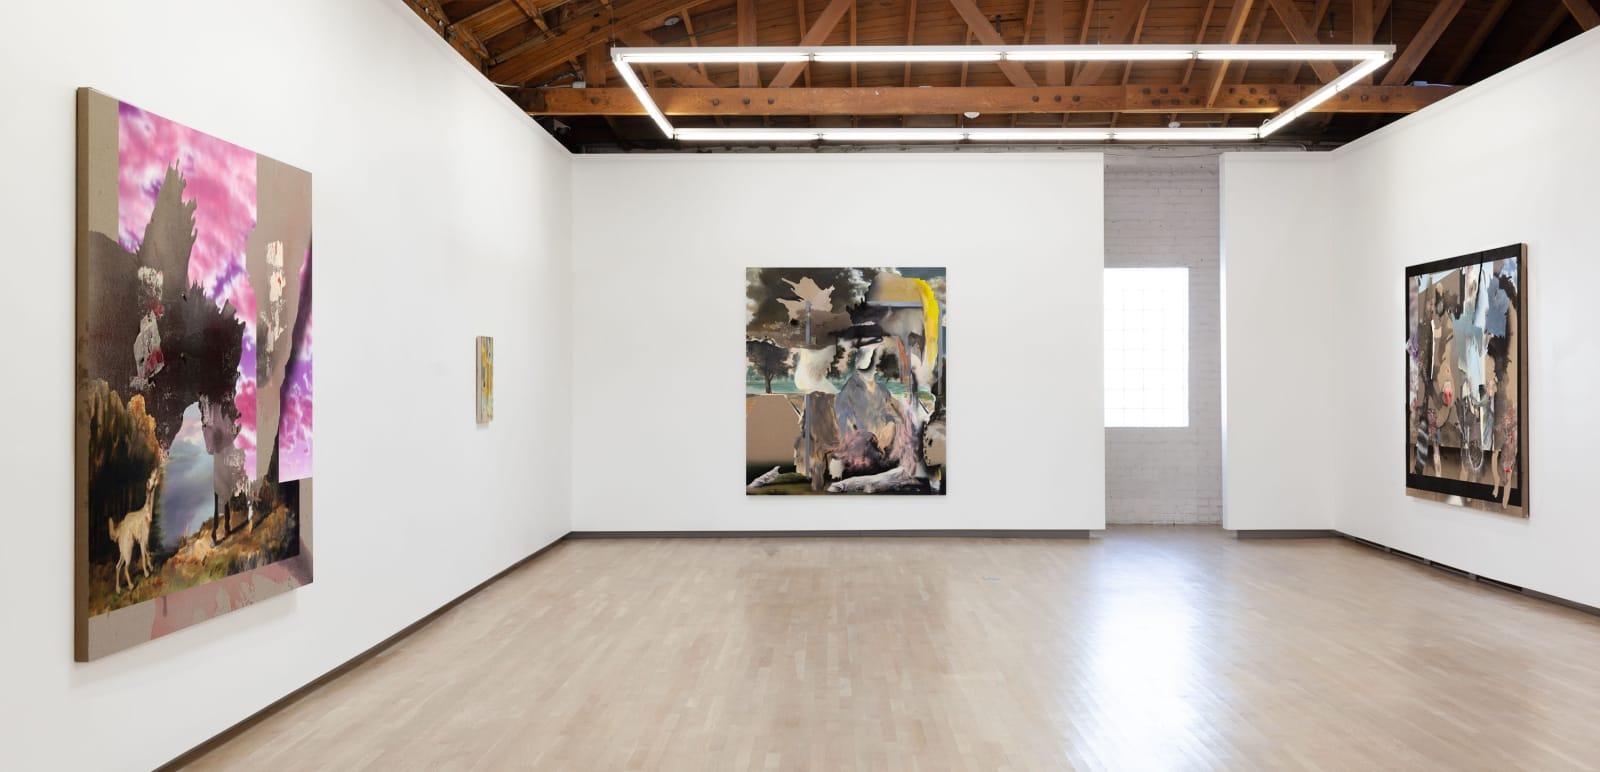 Annie Lapin. Strange Little Beast, Shulamit Nazarian, Los Angeles, 2019